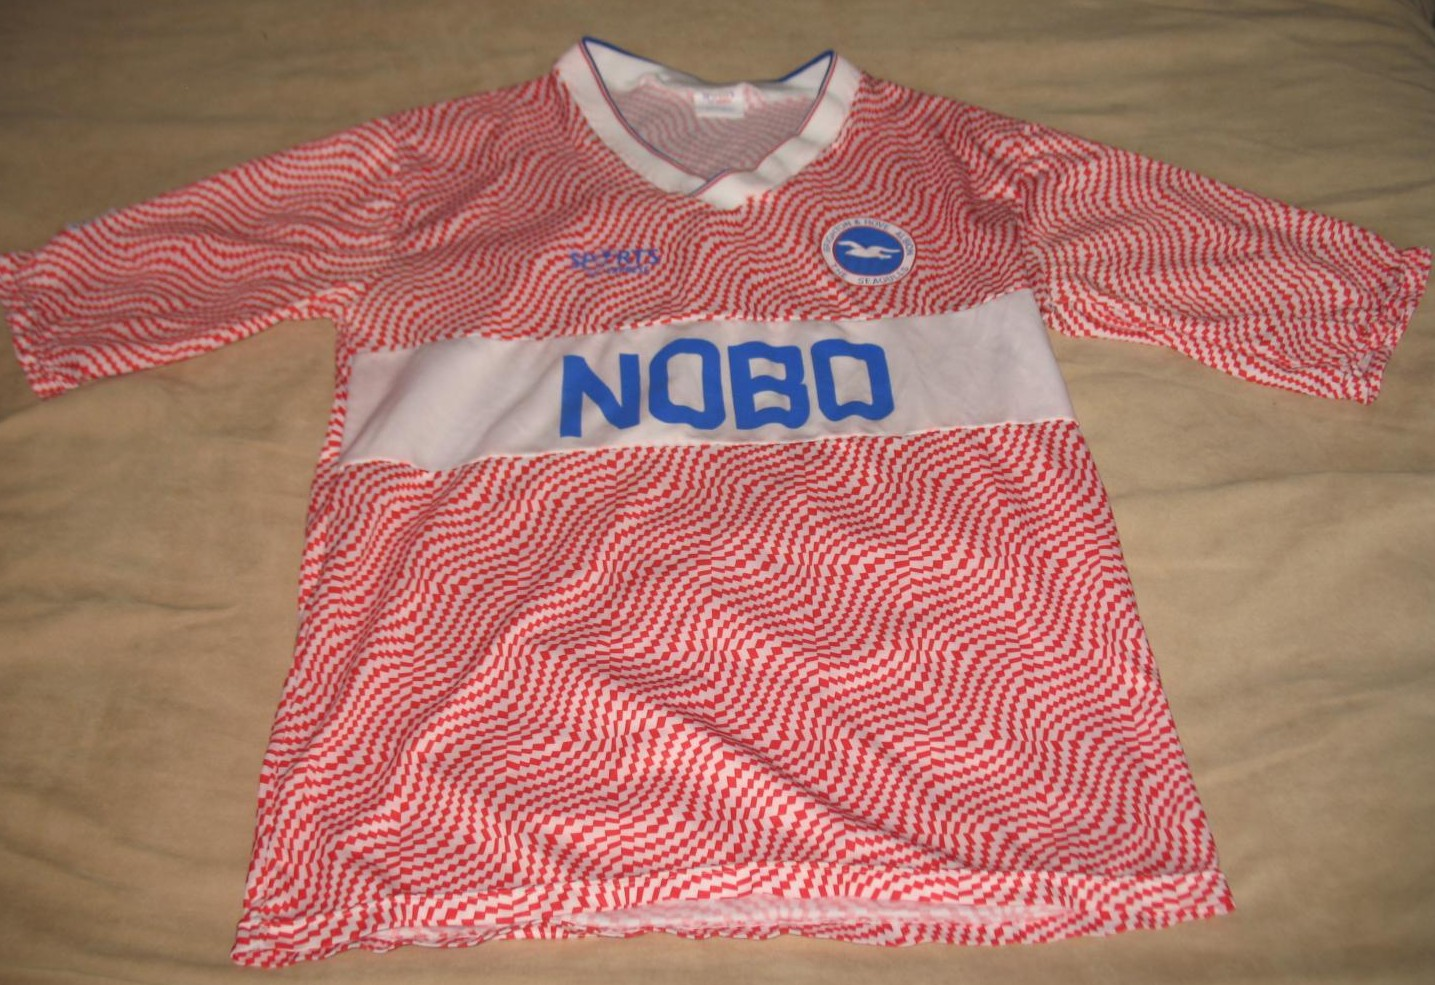 Brighton hove albion ext rieur maillot de foot 1989 for Maillot exterieur